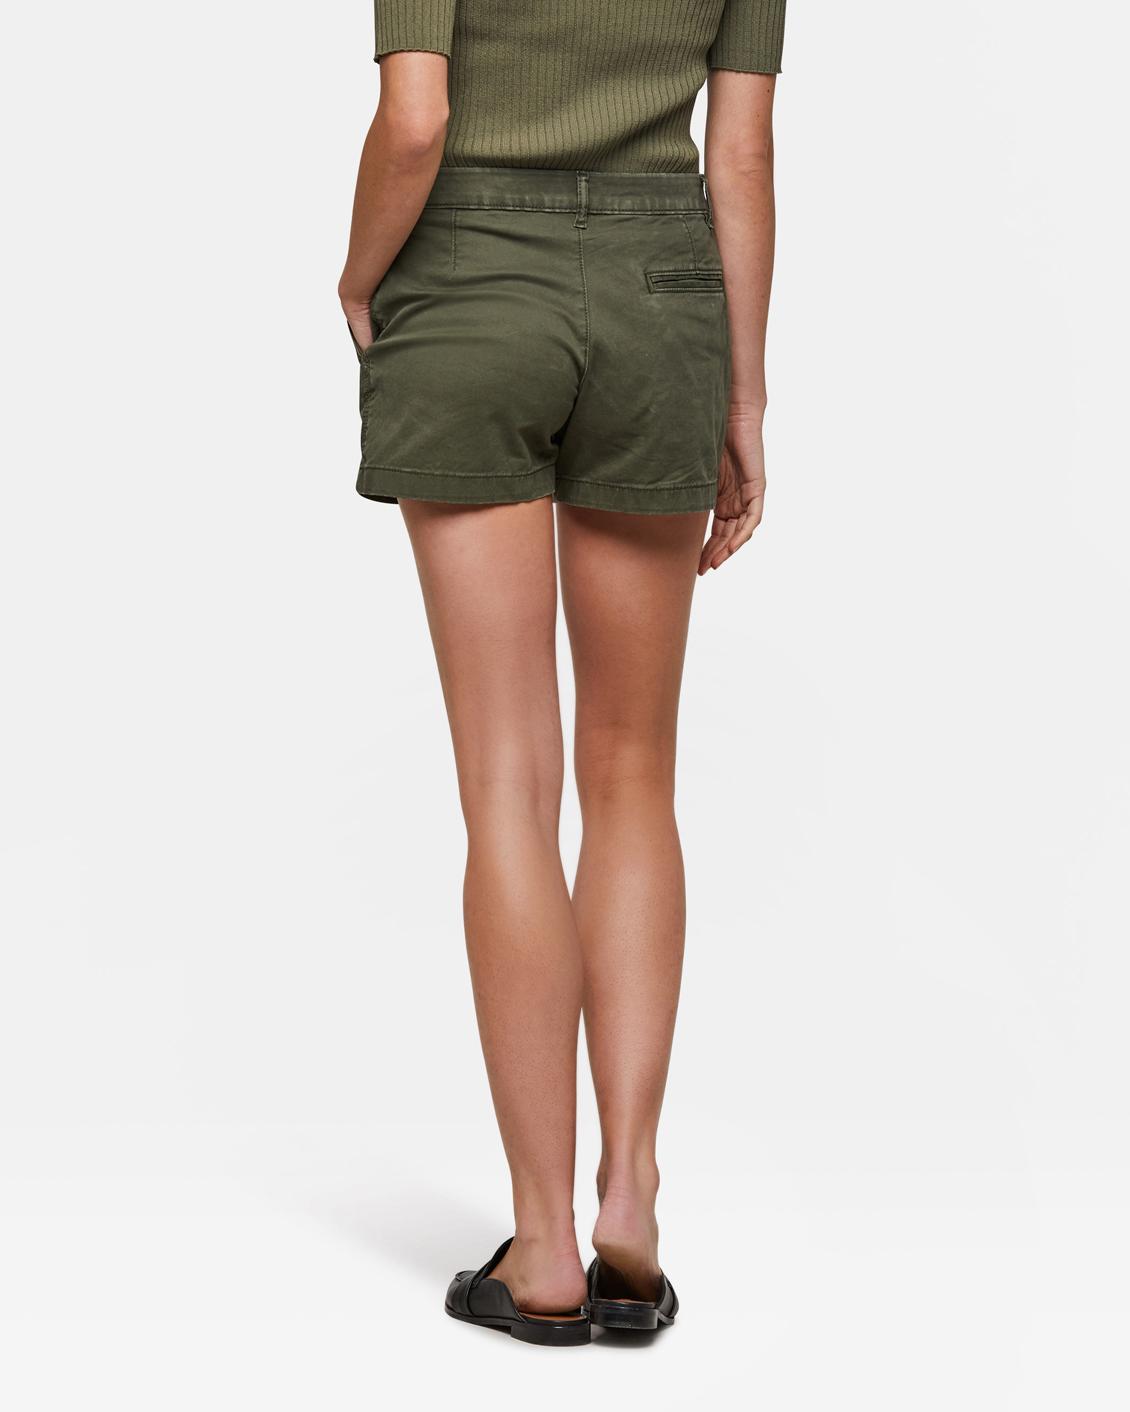 Camouflage Korte Broek Dames.Dames Slim Fit Chino Short 94224115 We Fashion